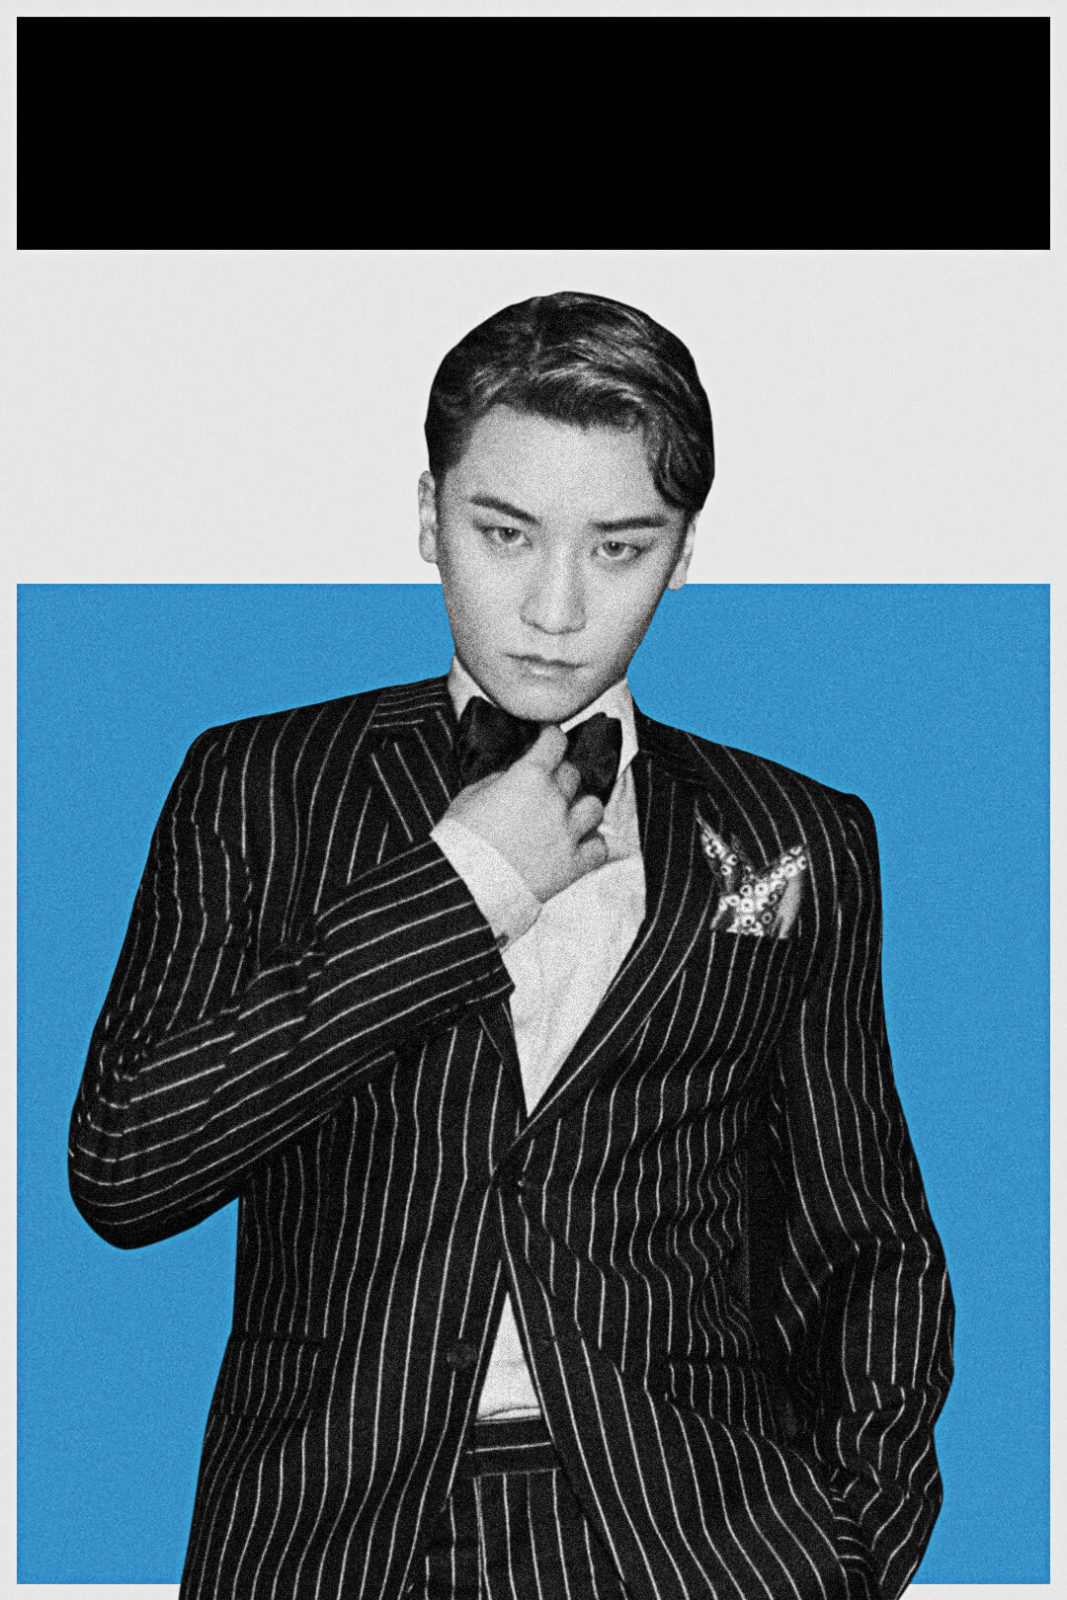 V.I (from BIGBANG)「ナインティナイン岡村隆史のオールナイトニッポン」に出演決定サムネイル画像